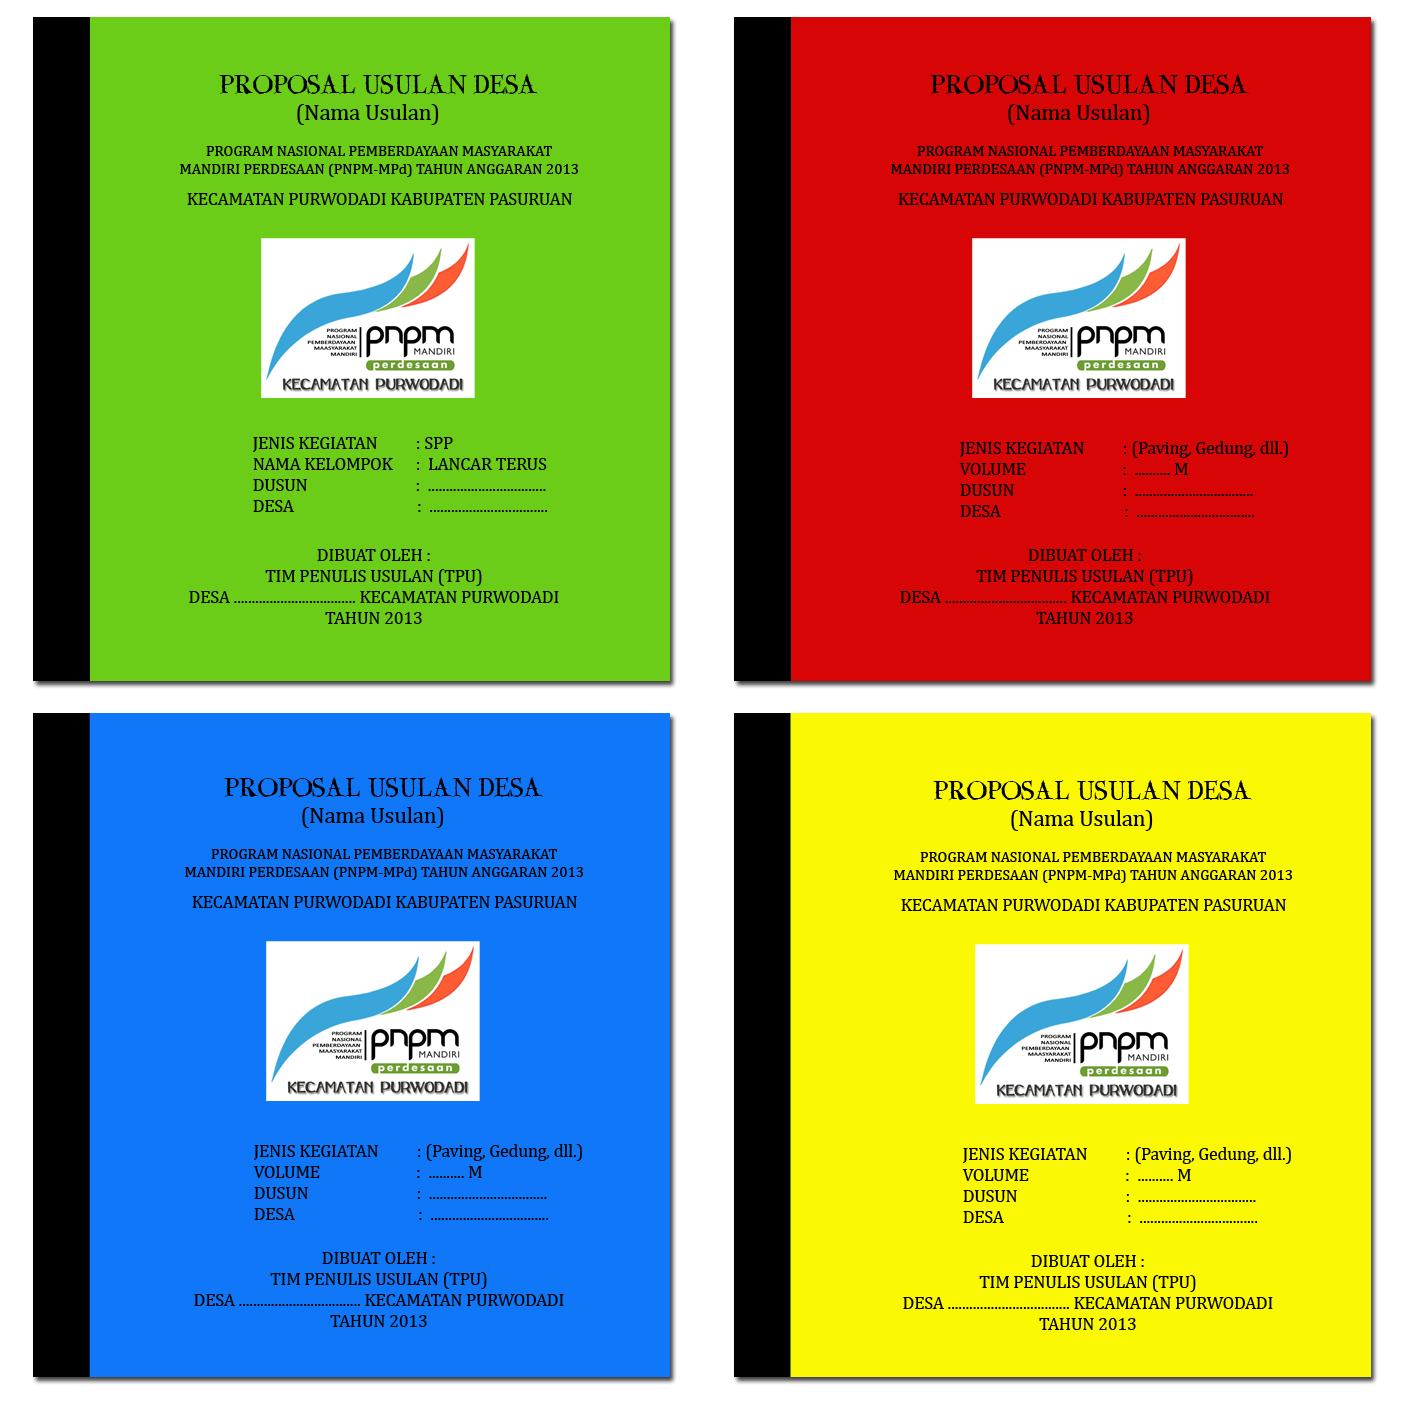 Contoh Proposal Pnpm Mandiri Skripsi Ilmu Administrasi Negara Contoh Proposal Tesis Pnpm Mandiri Perdesaan